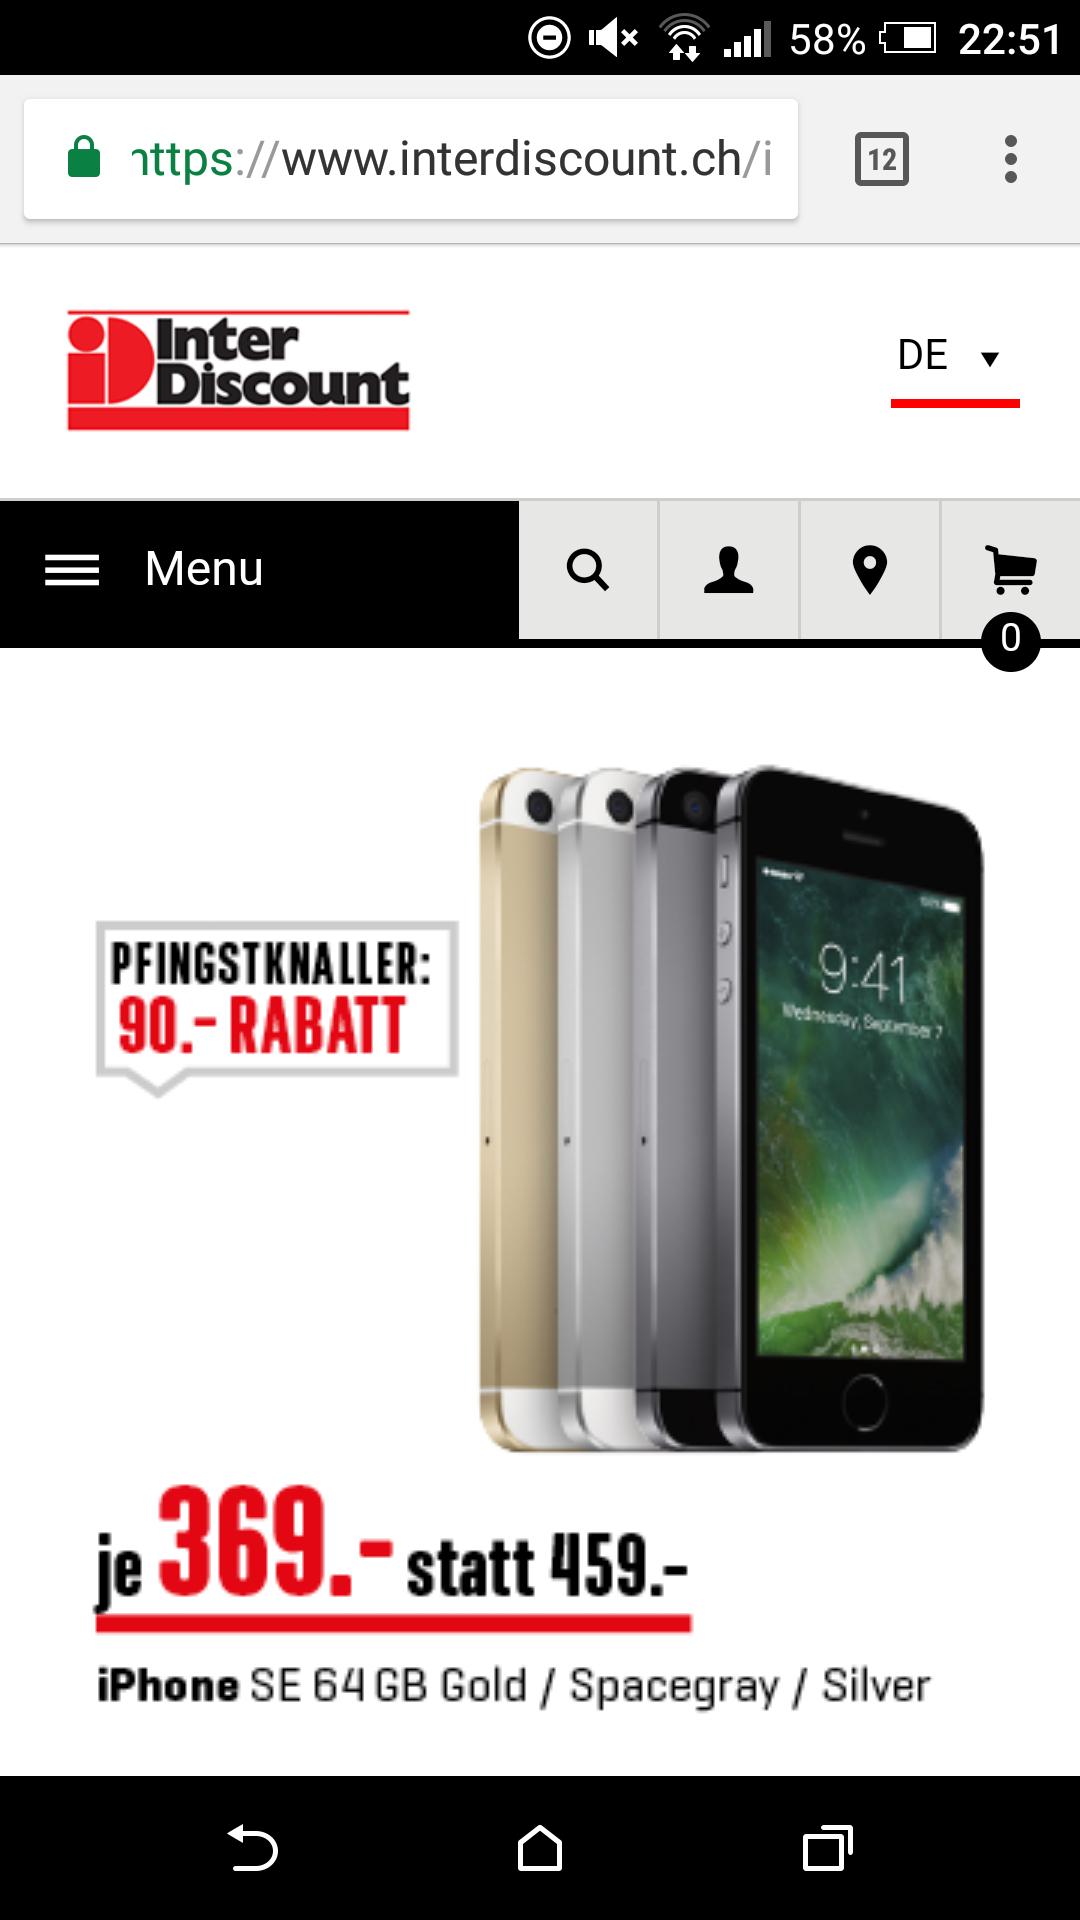 [Lokal Schweiz] Interdiscount IPhone SE 64 GB